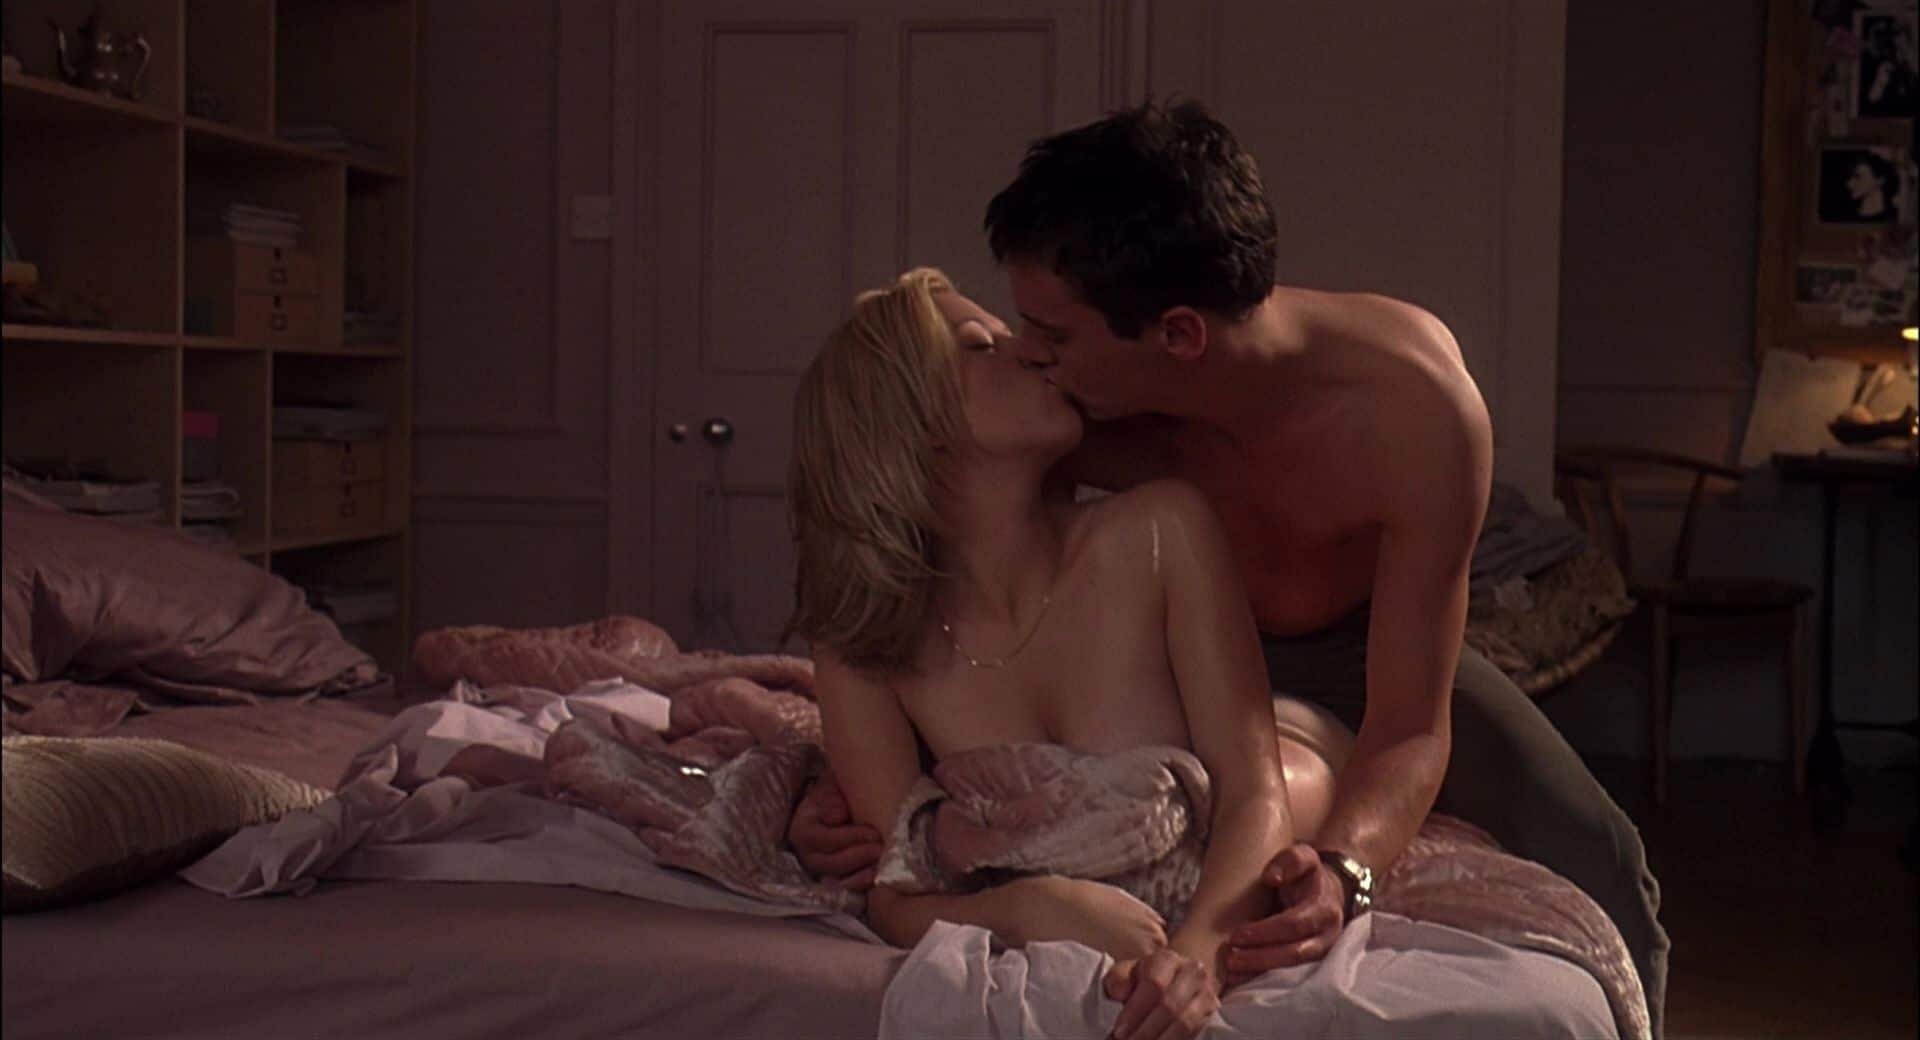 scarlett johansson nude pic